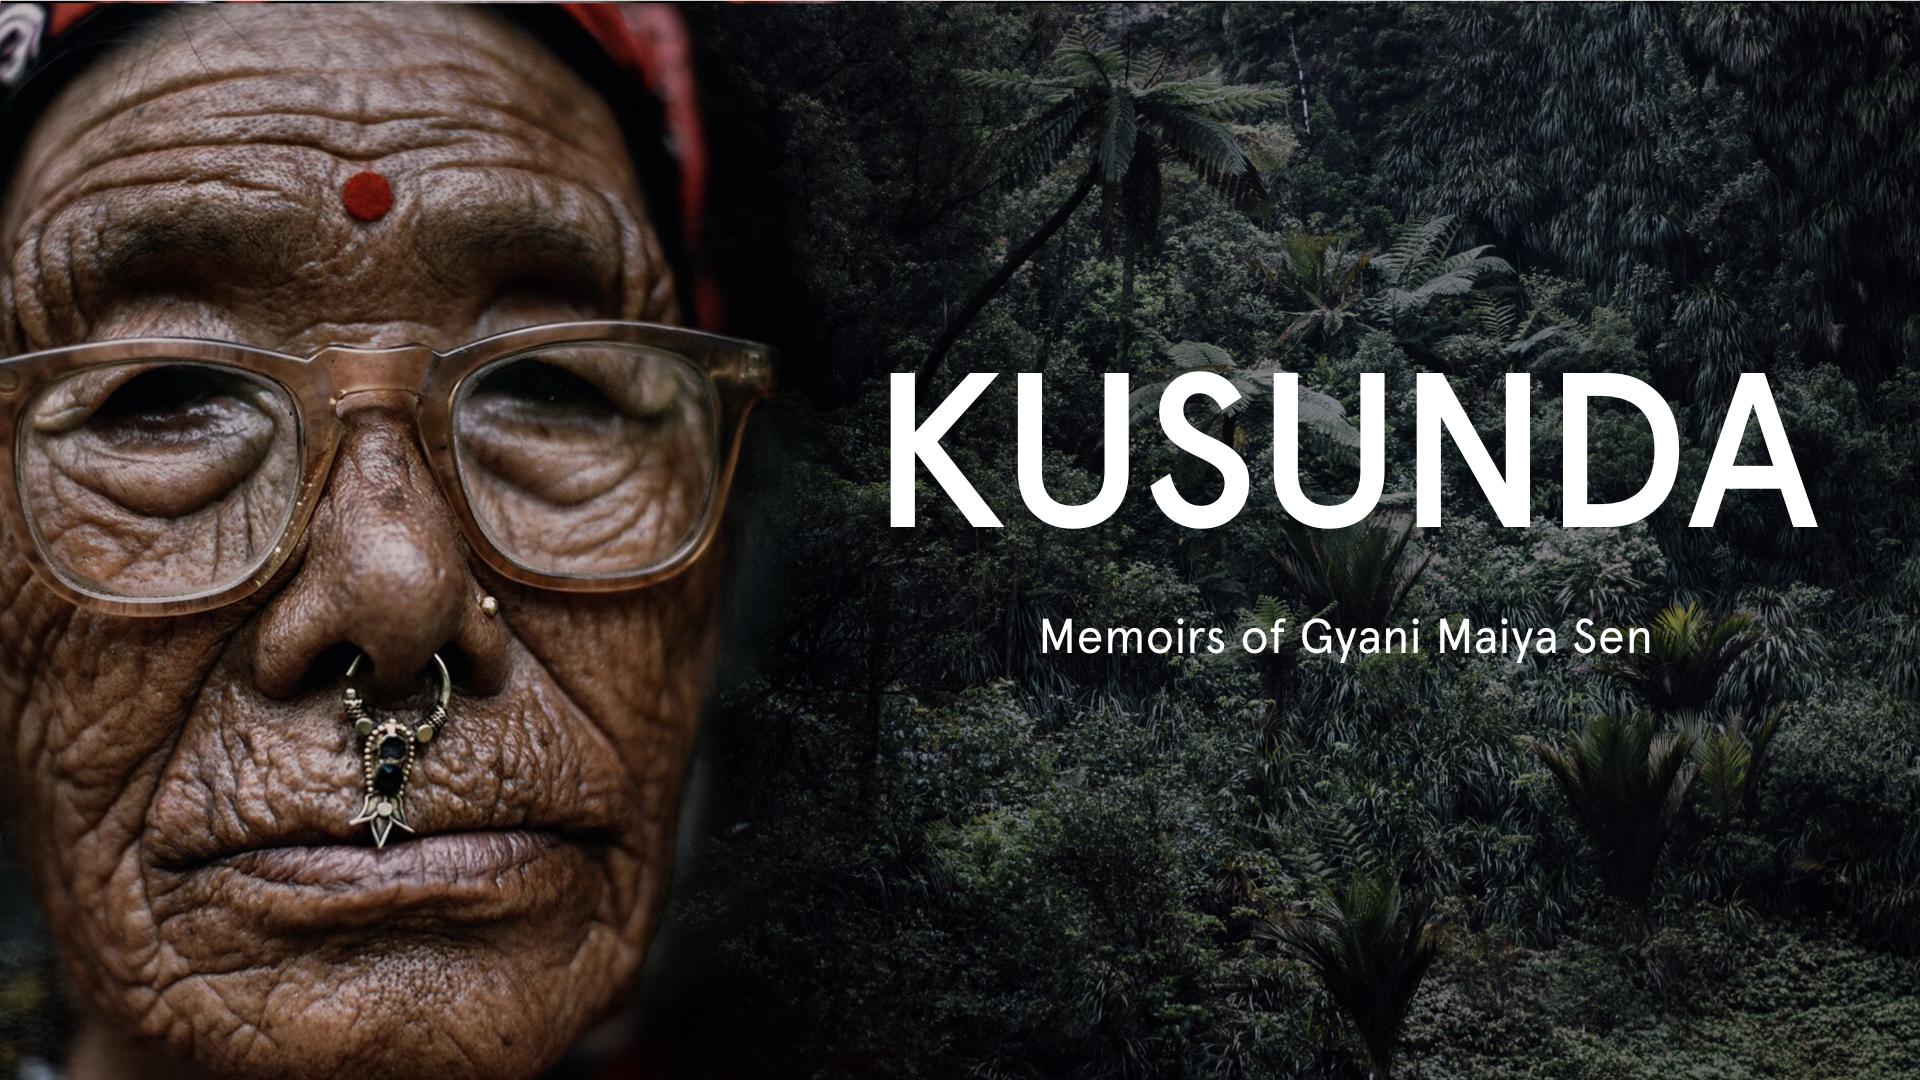 KUSUNDA